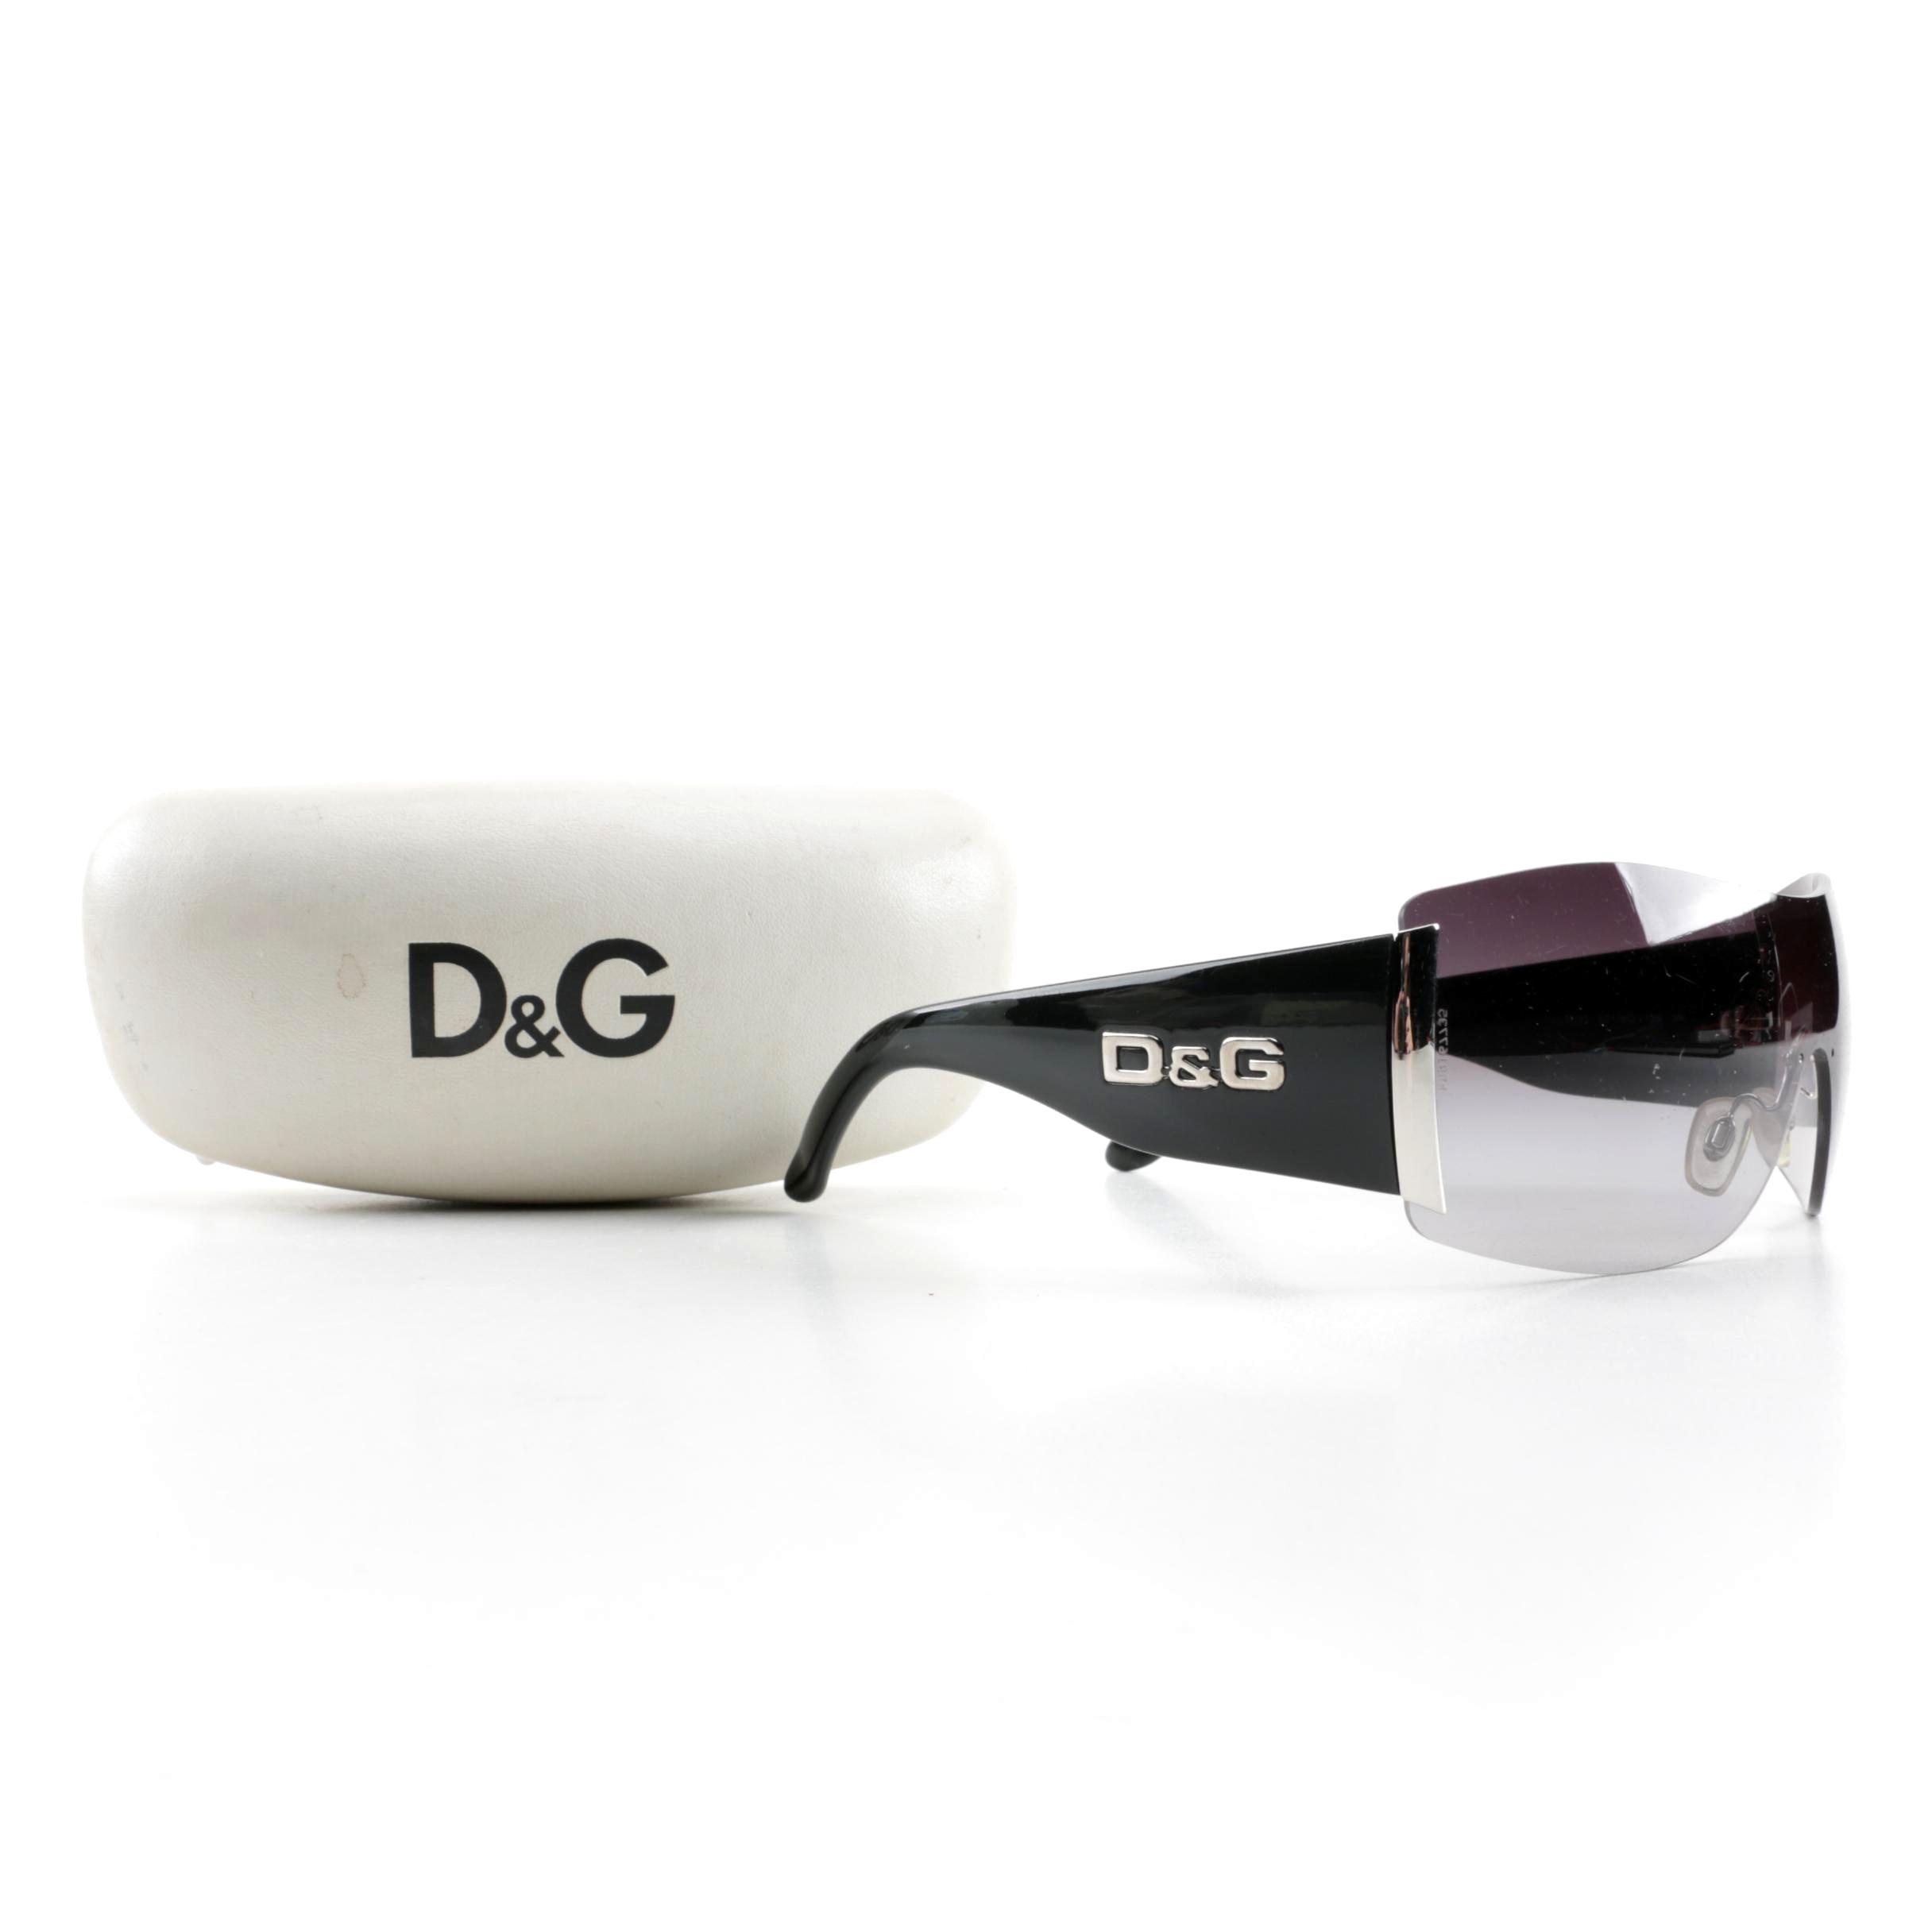 D&G Shield Sunglasses